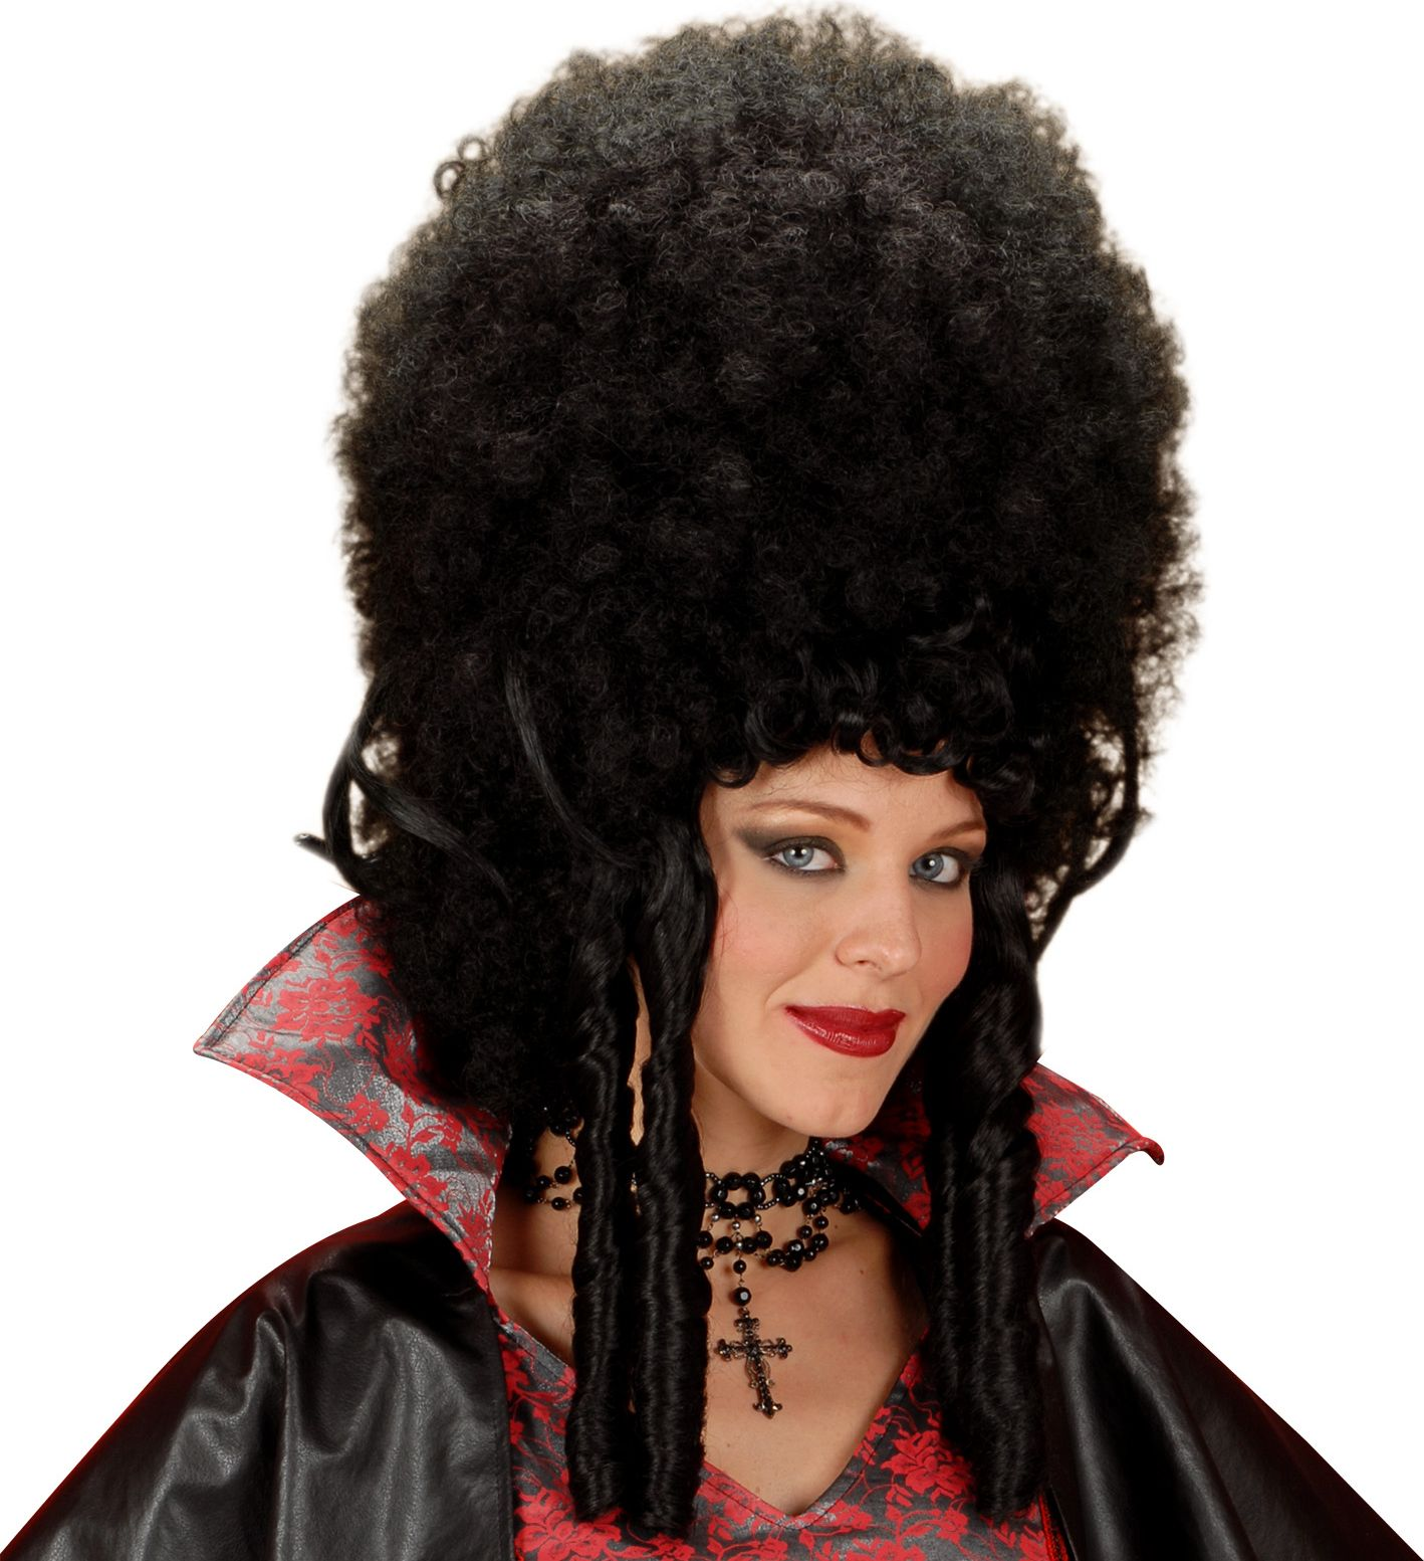 Zwarte Madame Bovary pruik